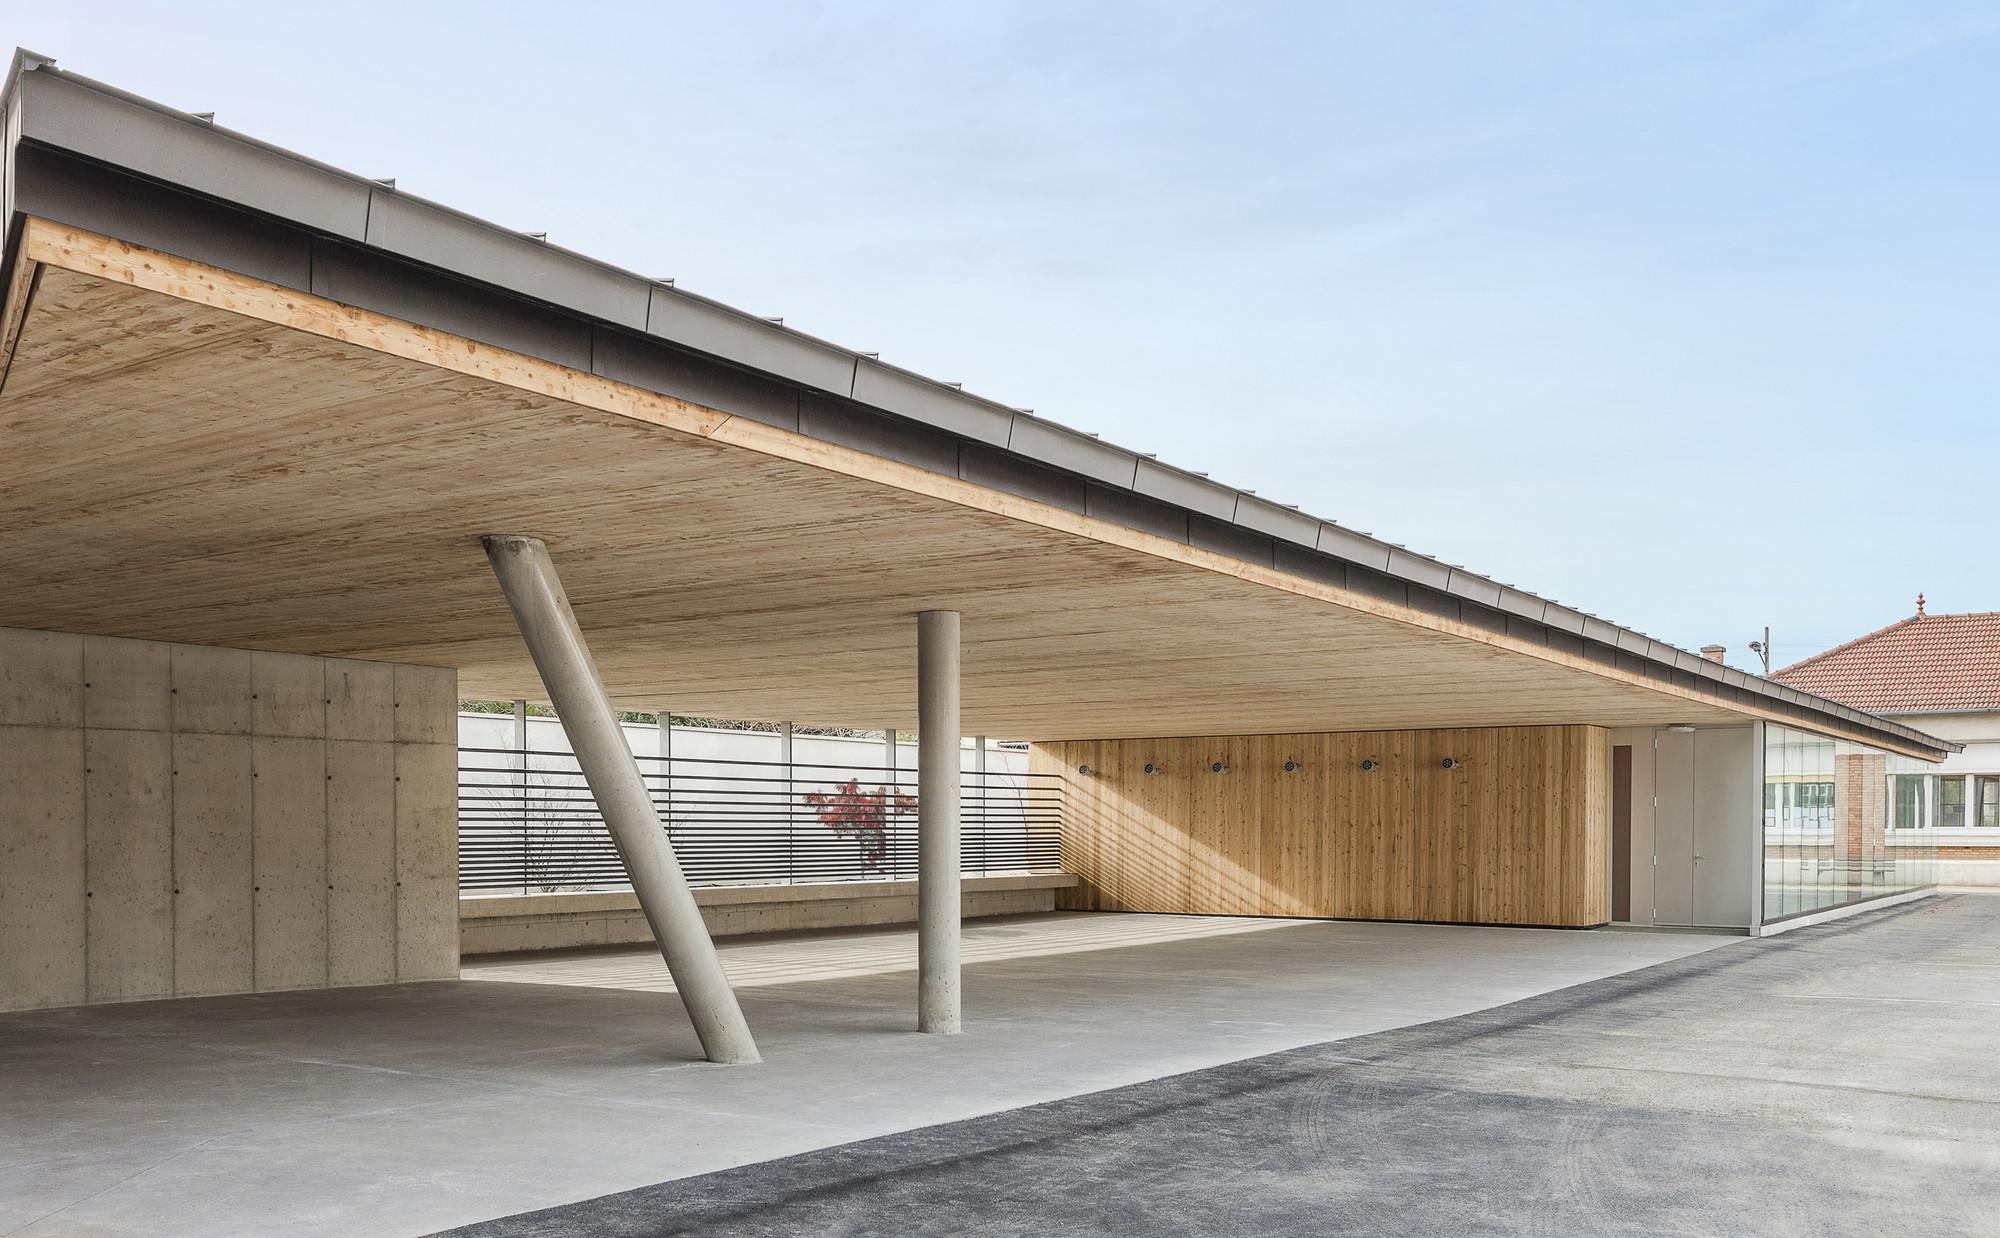 Primary School J.Jaurès II / YOONSEUX Architectes, © Fabrice Dunou